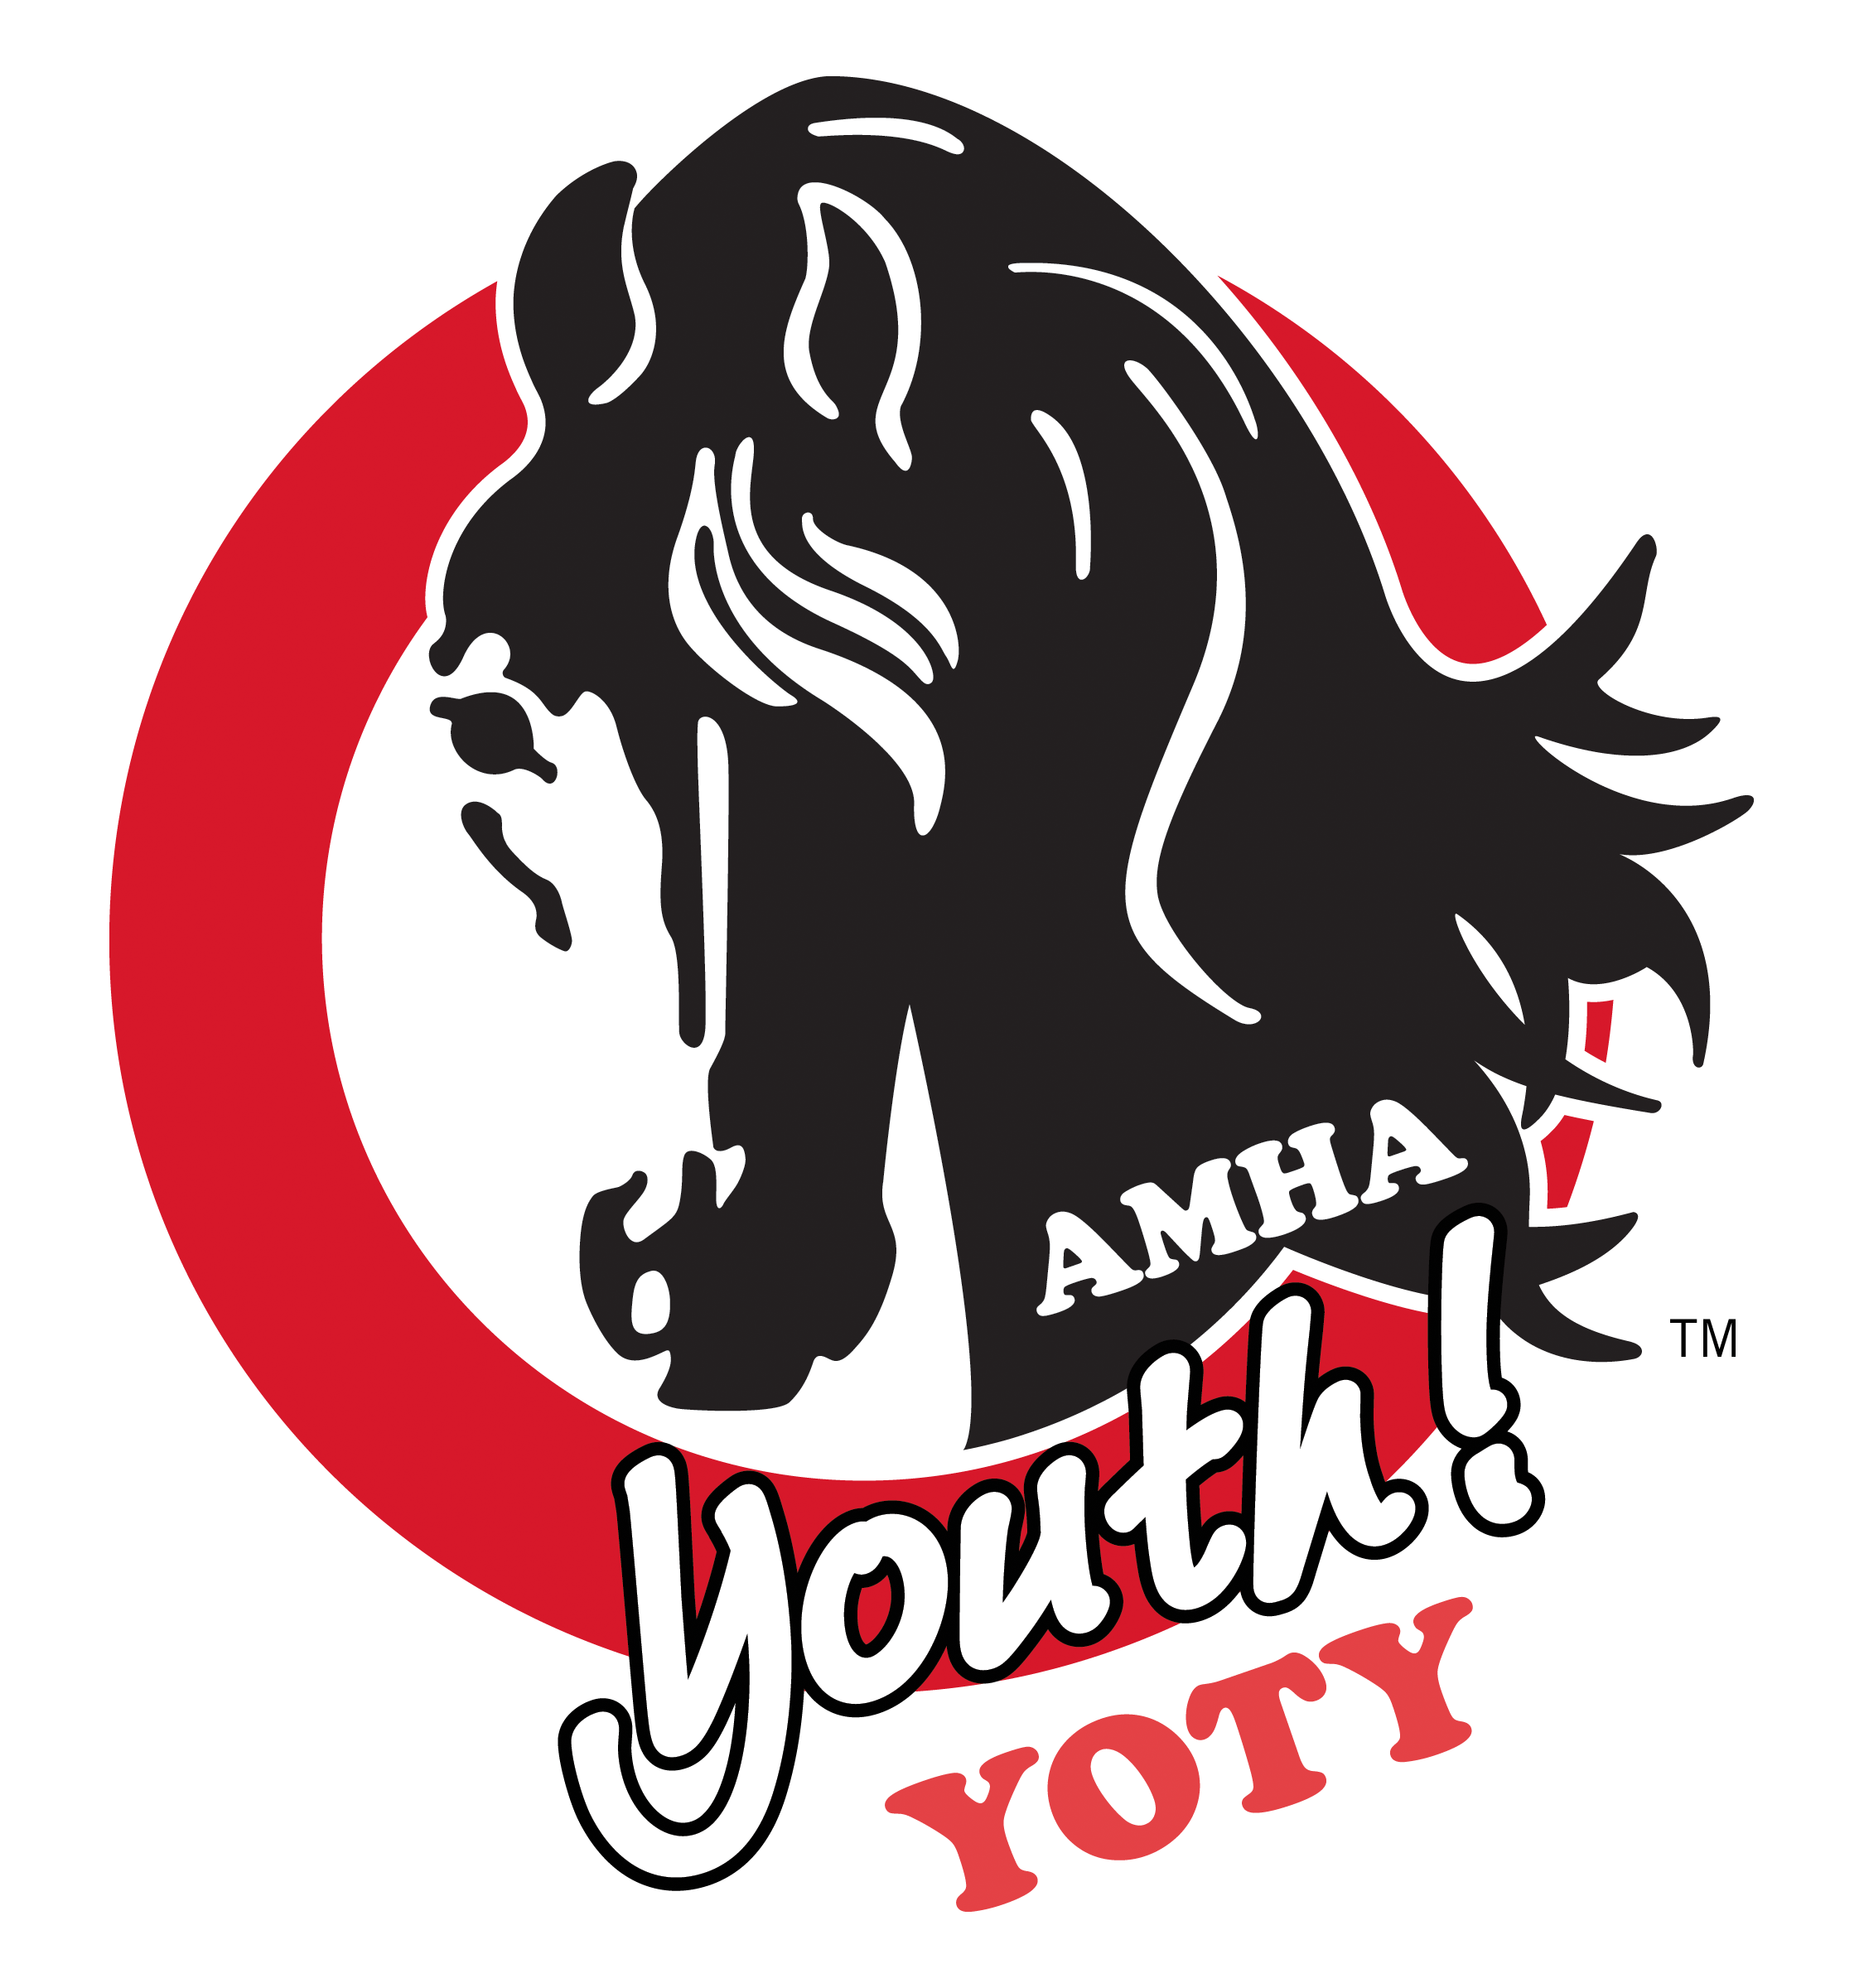 news_amhayouth_logo2021_yoty.png